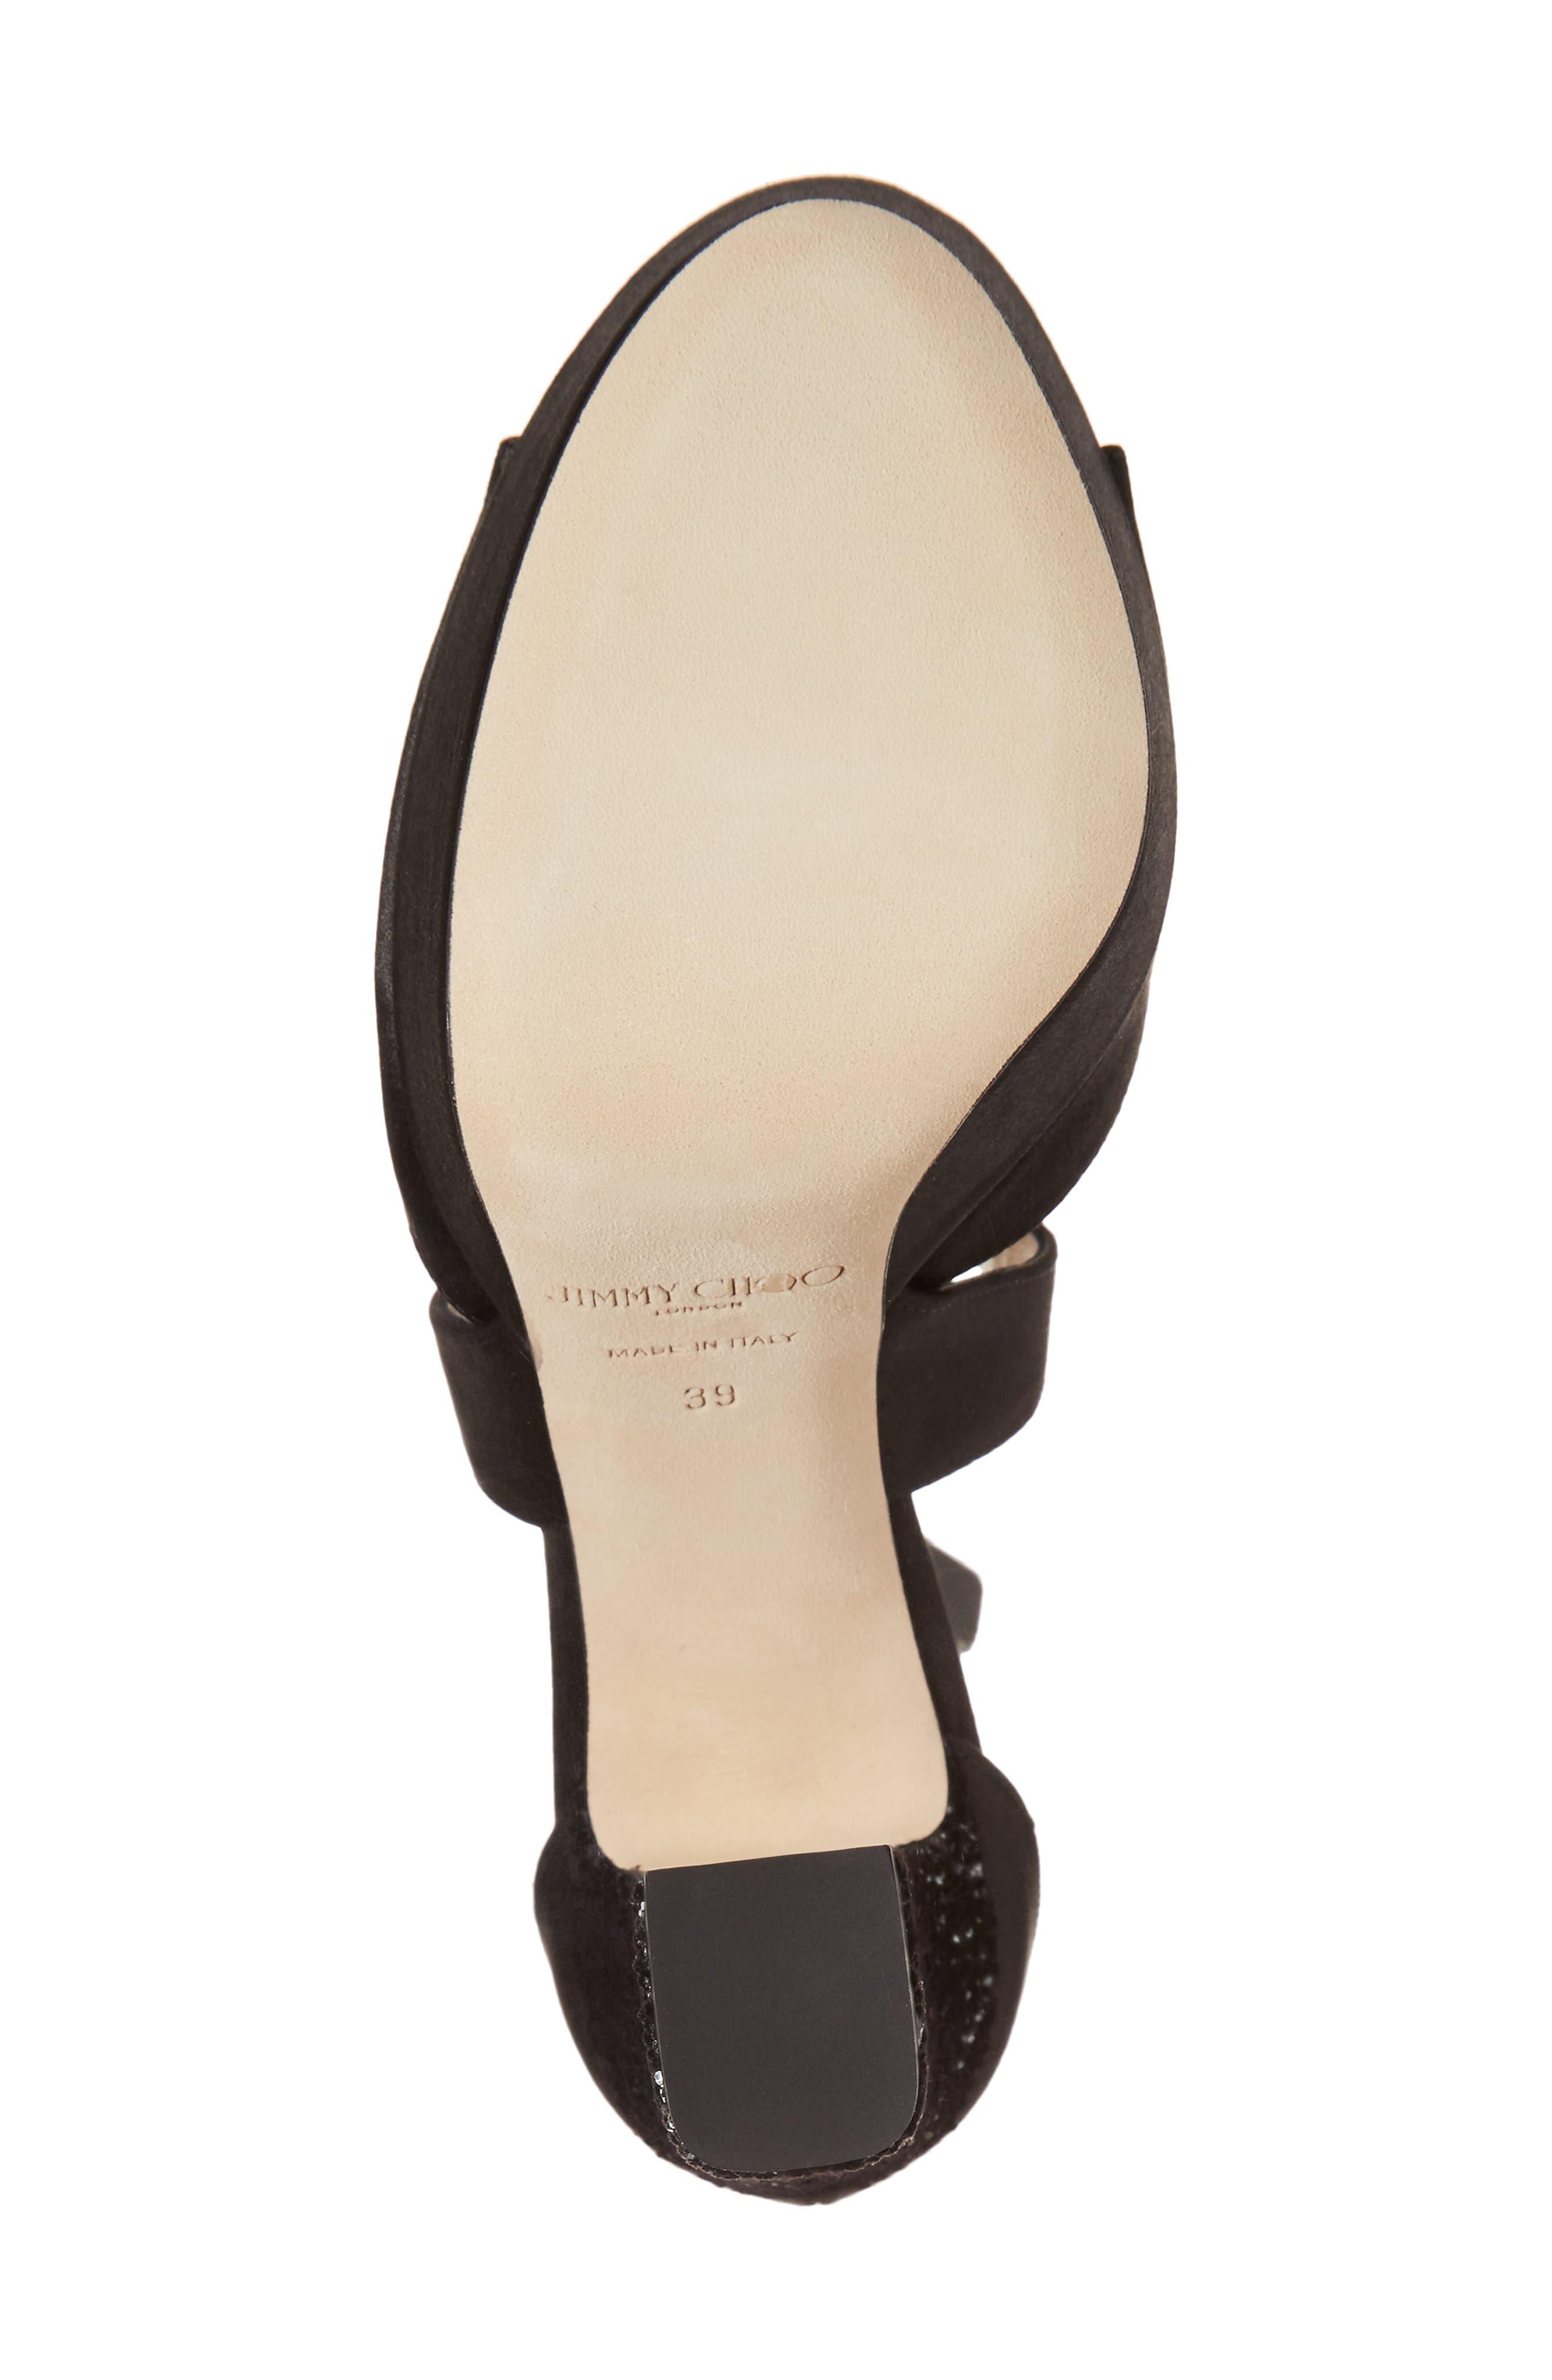 April Platform Sandal,                             Alternate thumbnail 6, color,                             Black/ Anthracite/ Black